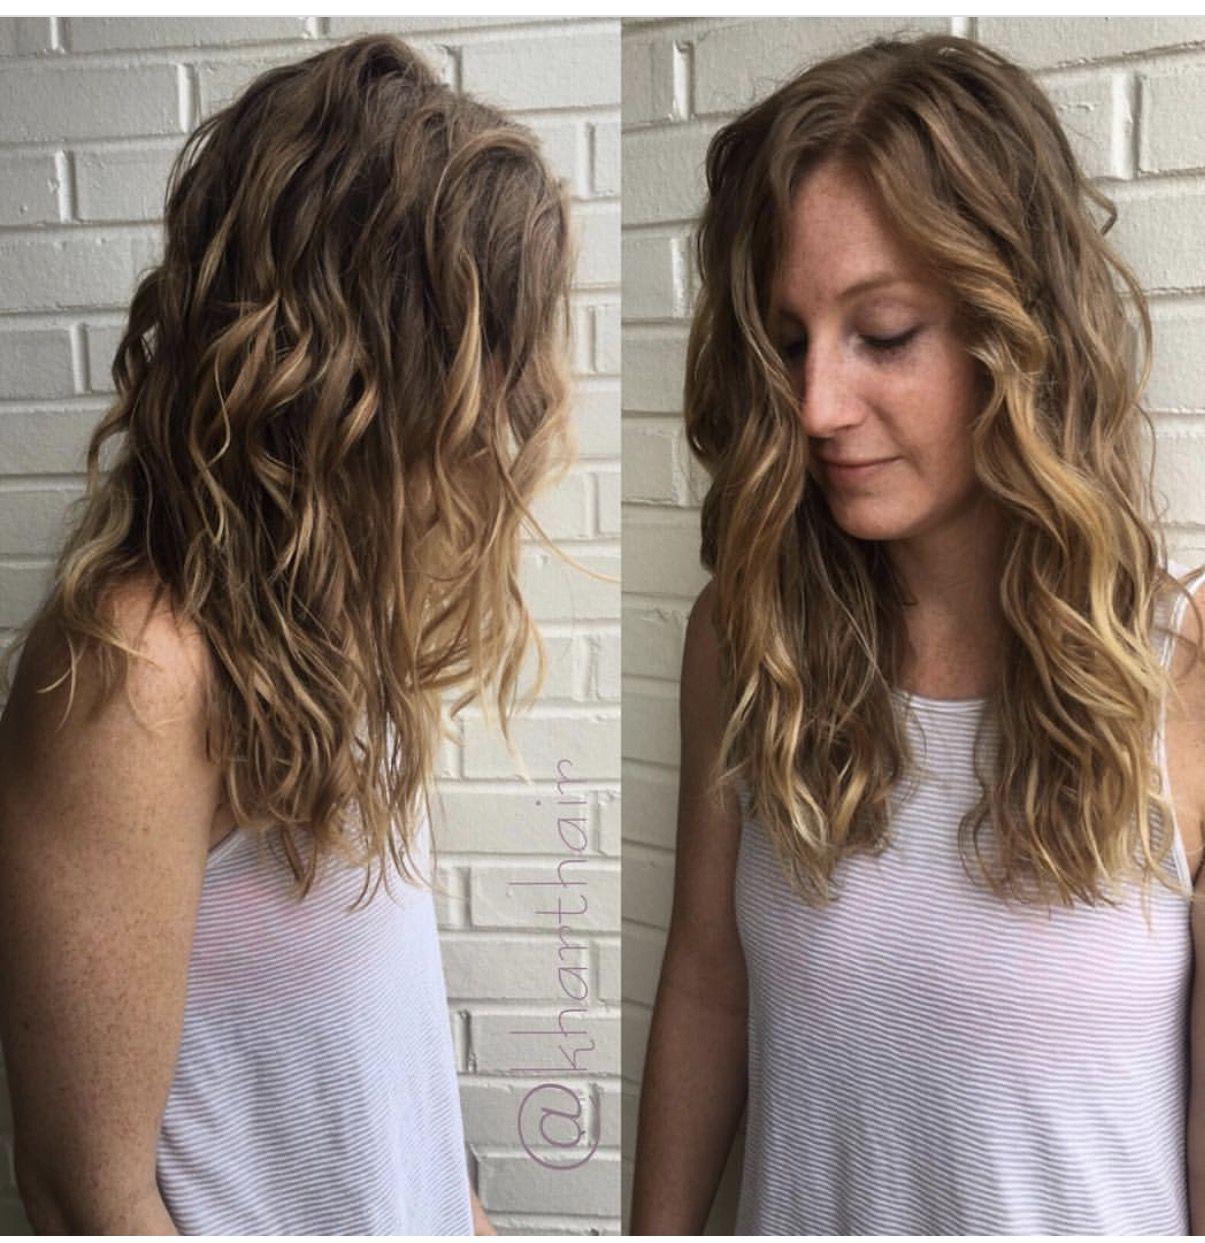 olaplex perm i don't like this perm for me | hair. skin